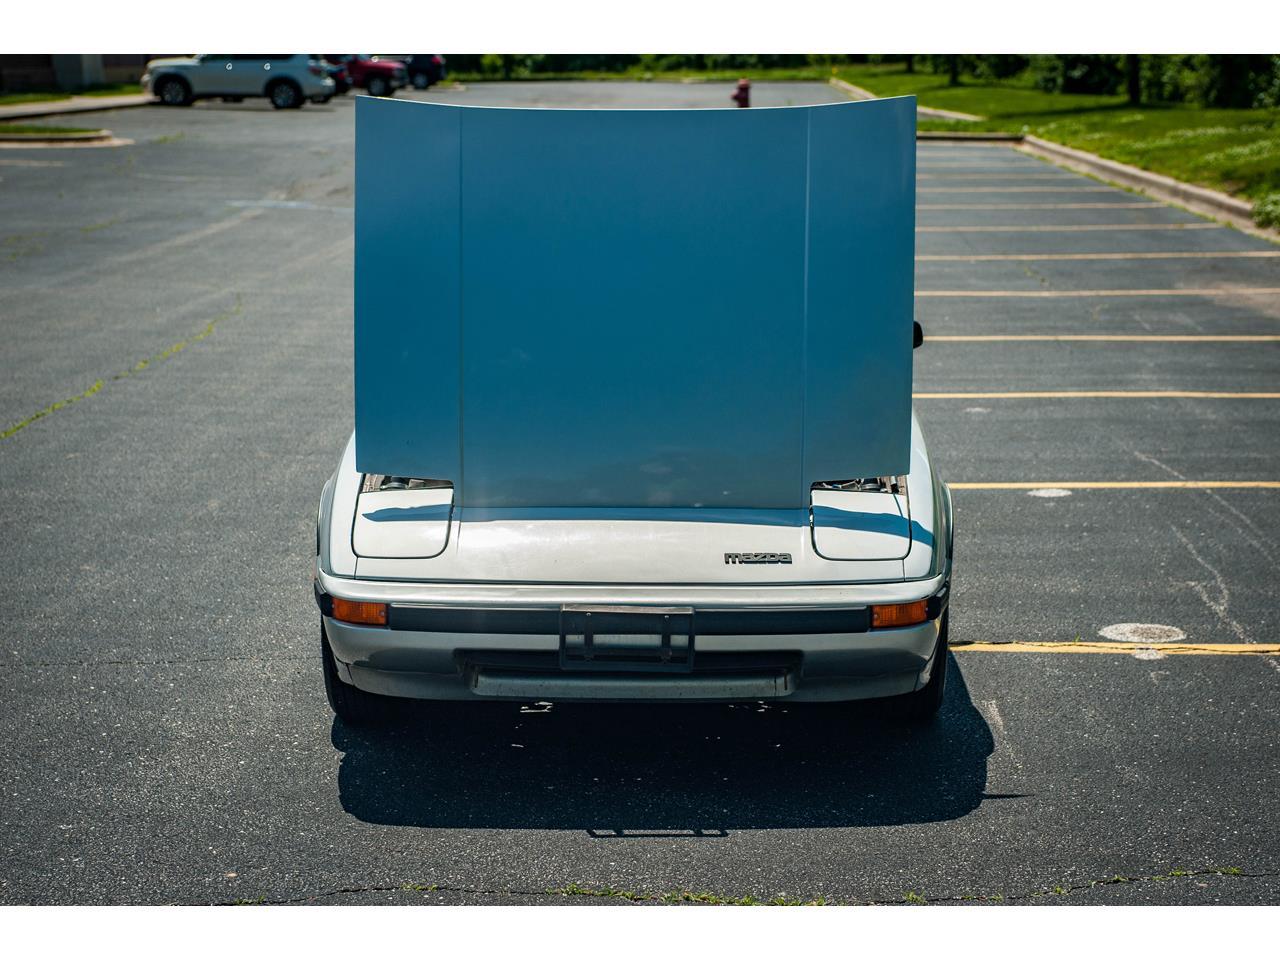 Large Picture of '82 RX-7 located in O'Fallon Illinois - $14,500.00 - QB9V